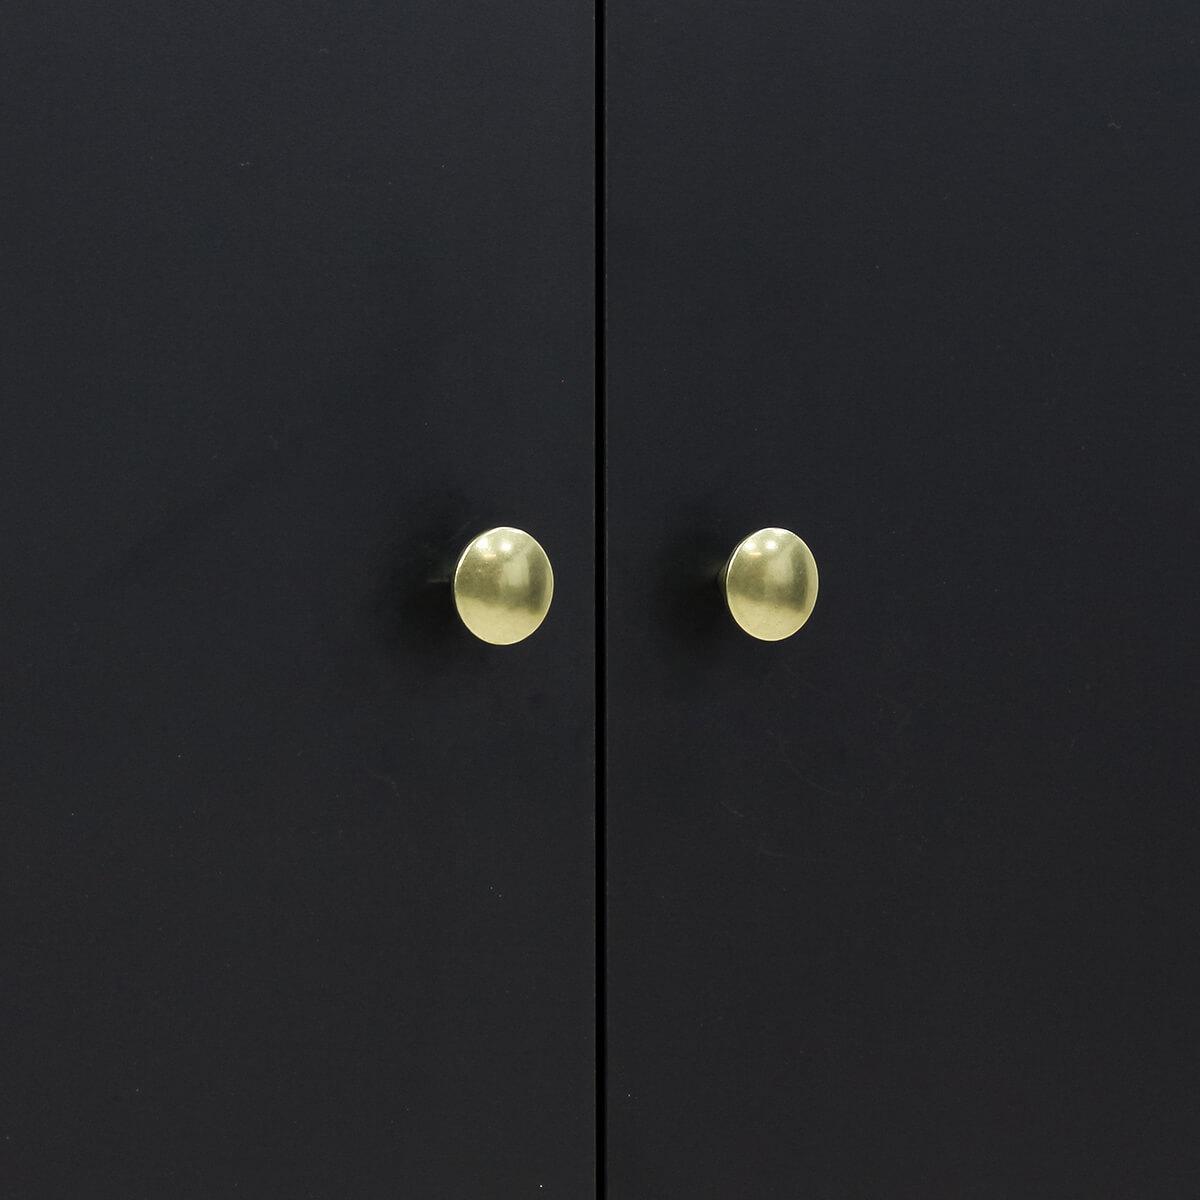 Kleiderschrank 3 Türen CLOË Bopita Bopita Matt Black